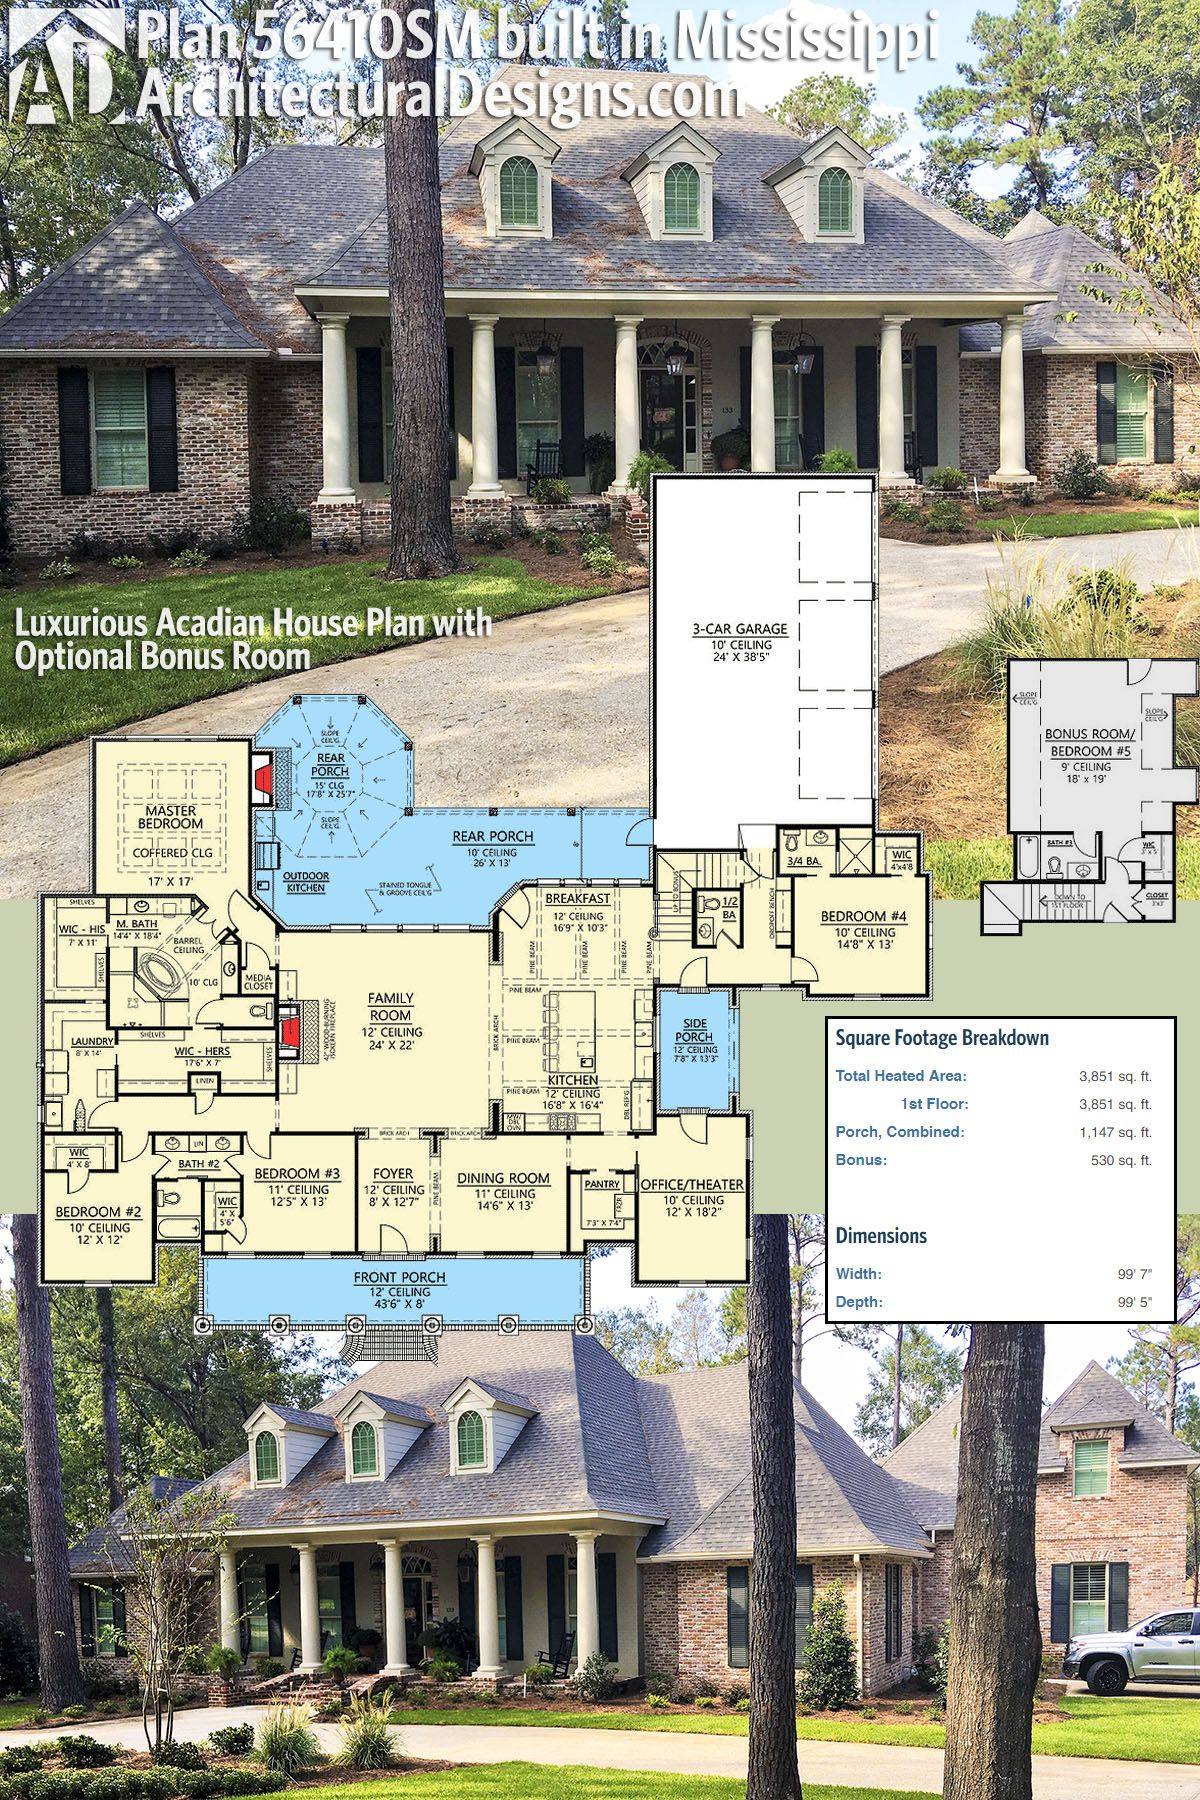 3 Bedroom Acadian Home Plan SM